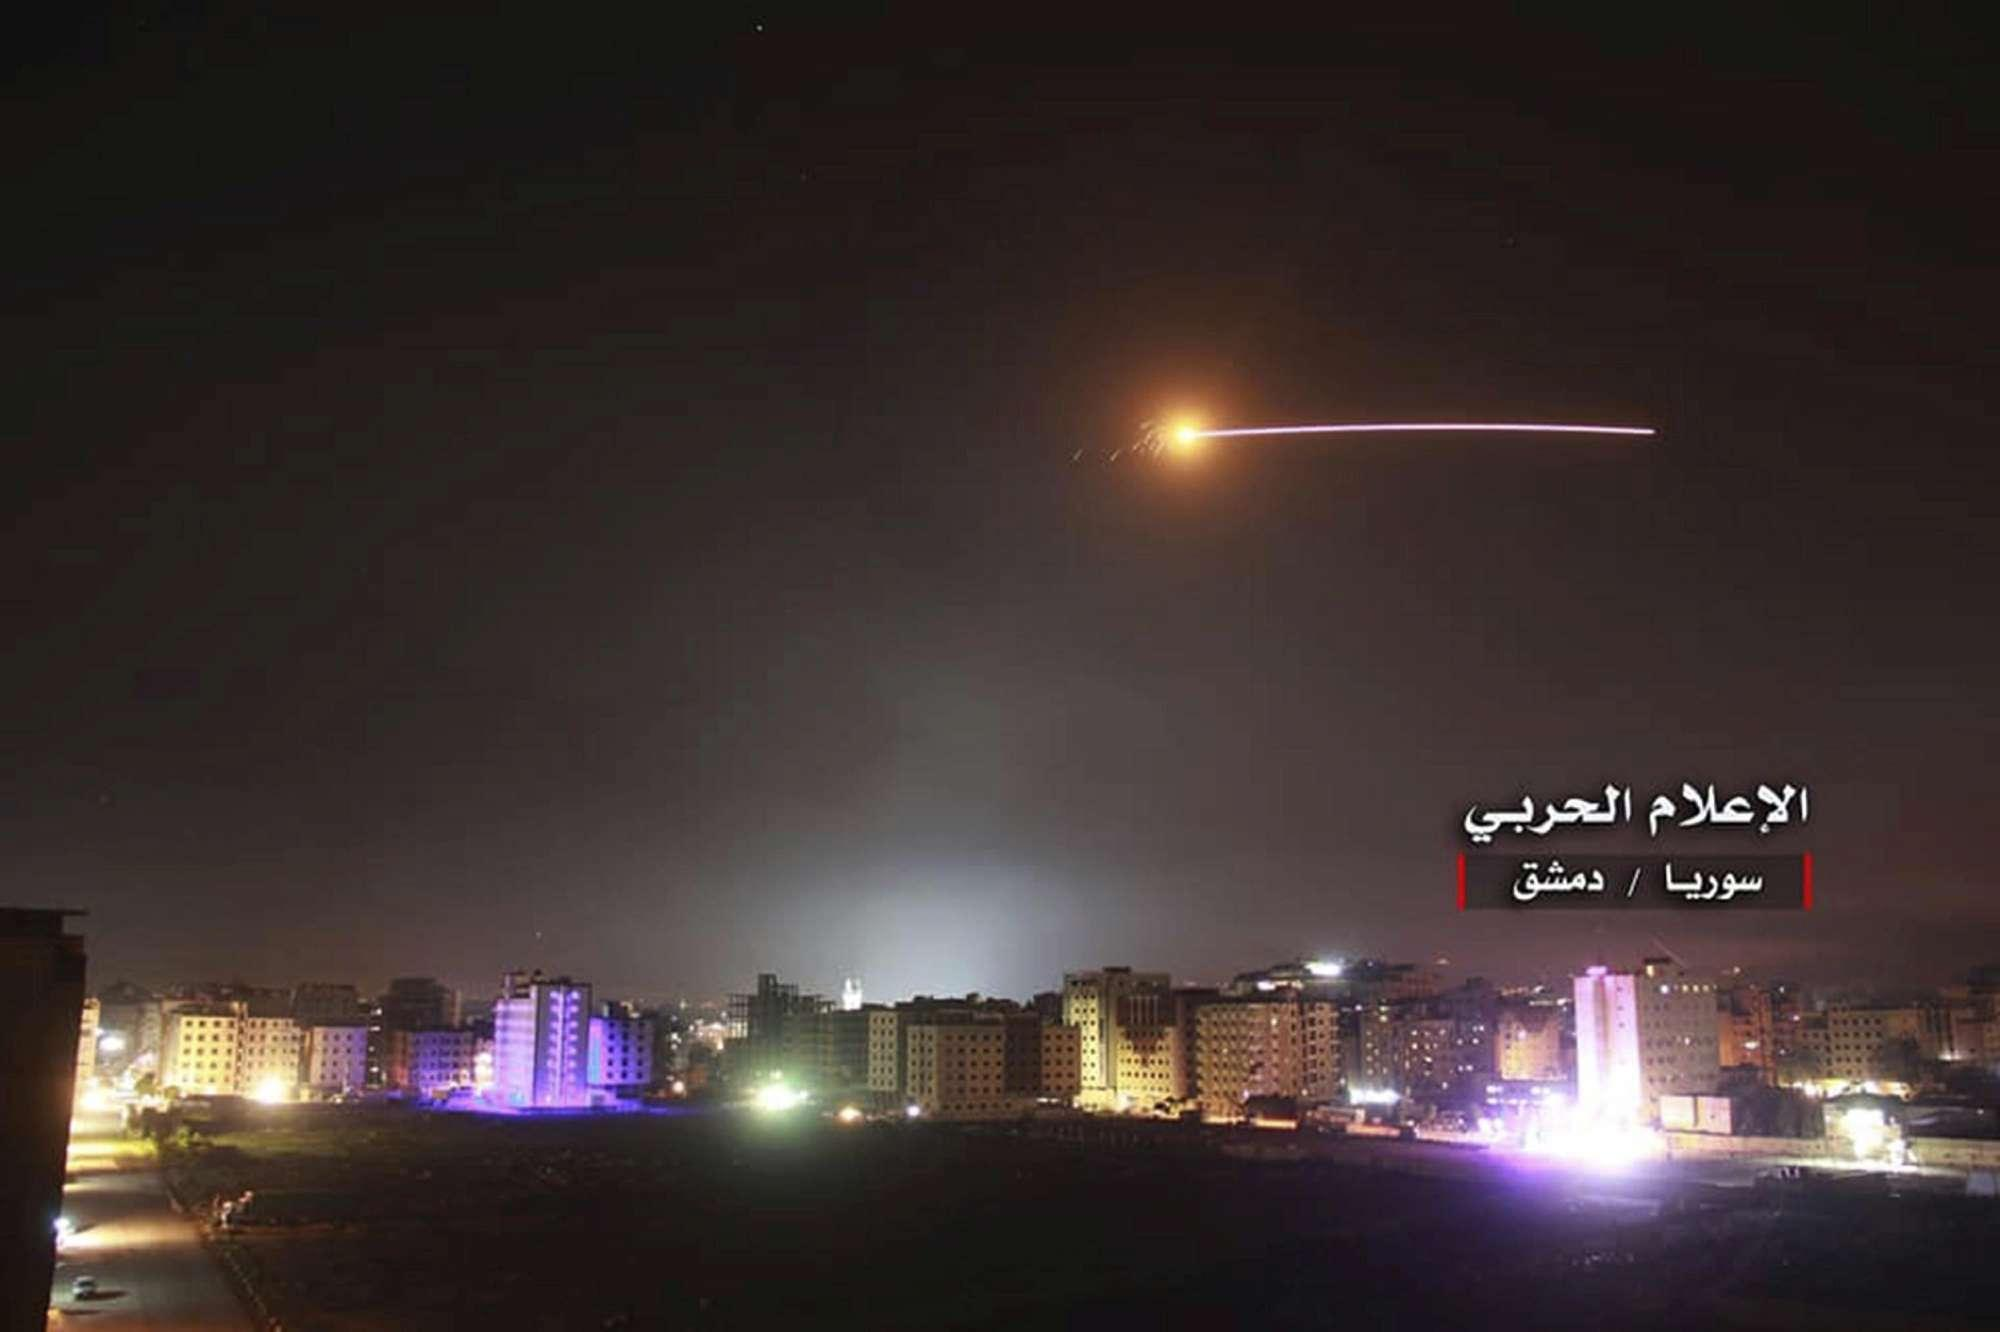 Il raid di Israele in Siria